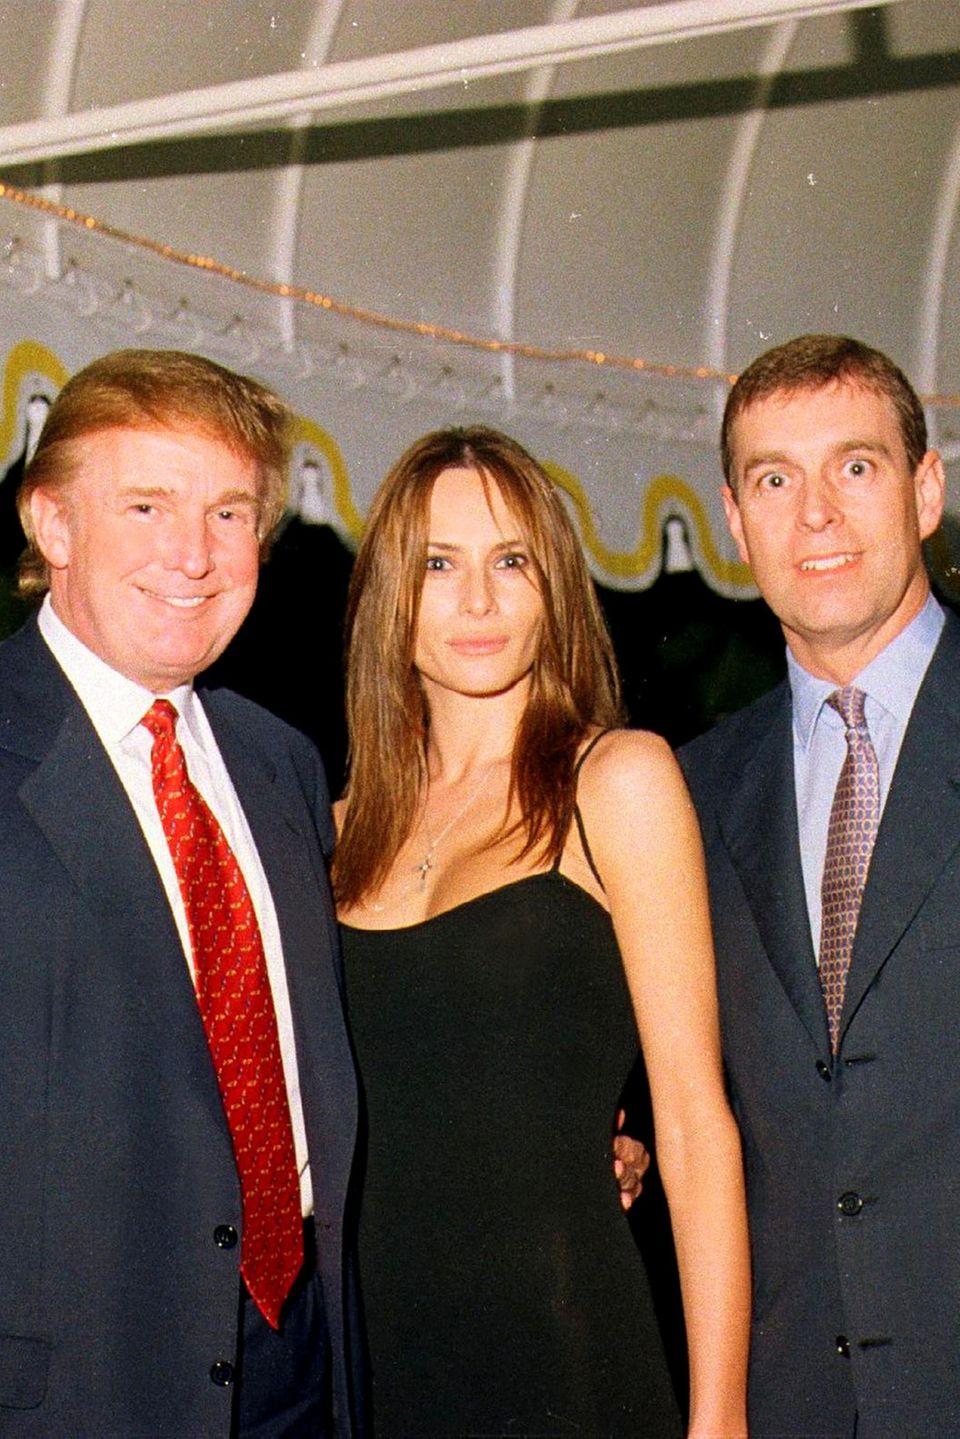 Donald Trump, Melania Trump und Prinz Andrew auf einer Party am 12. Februar 2000 in Florida.